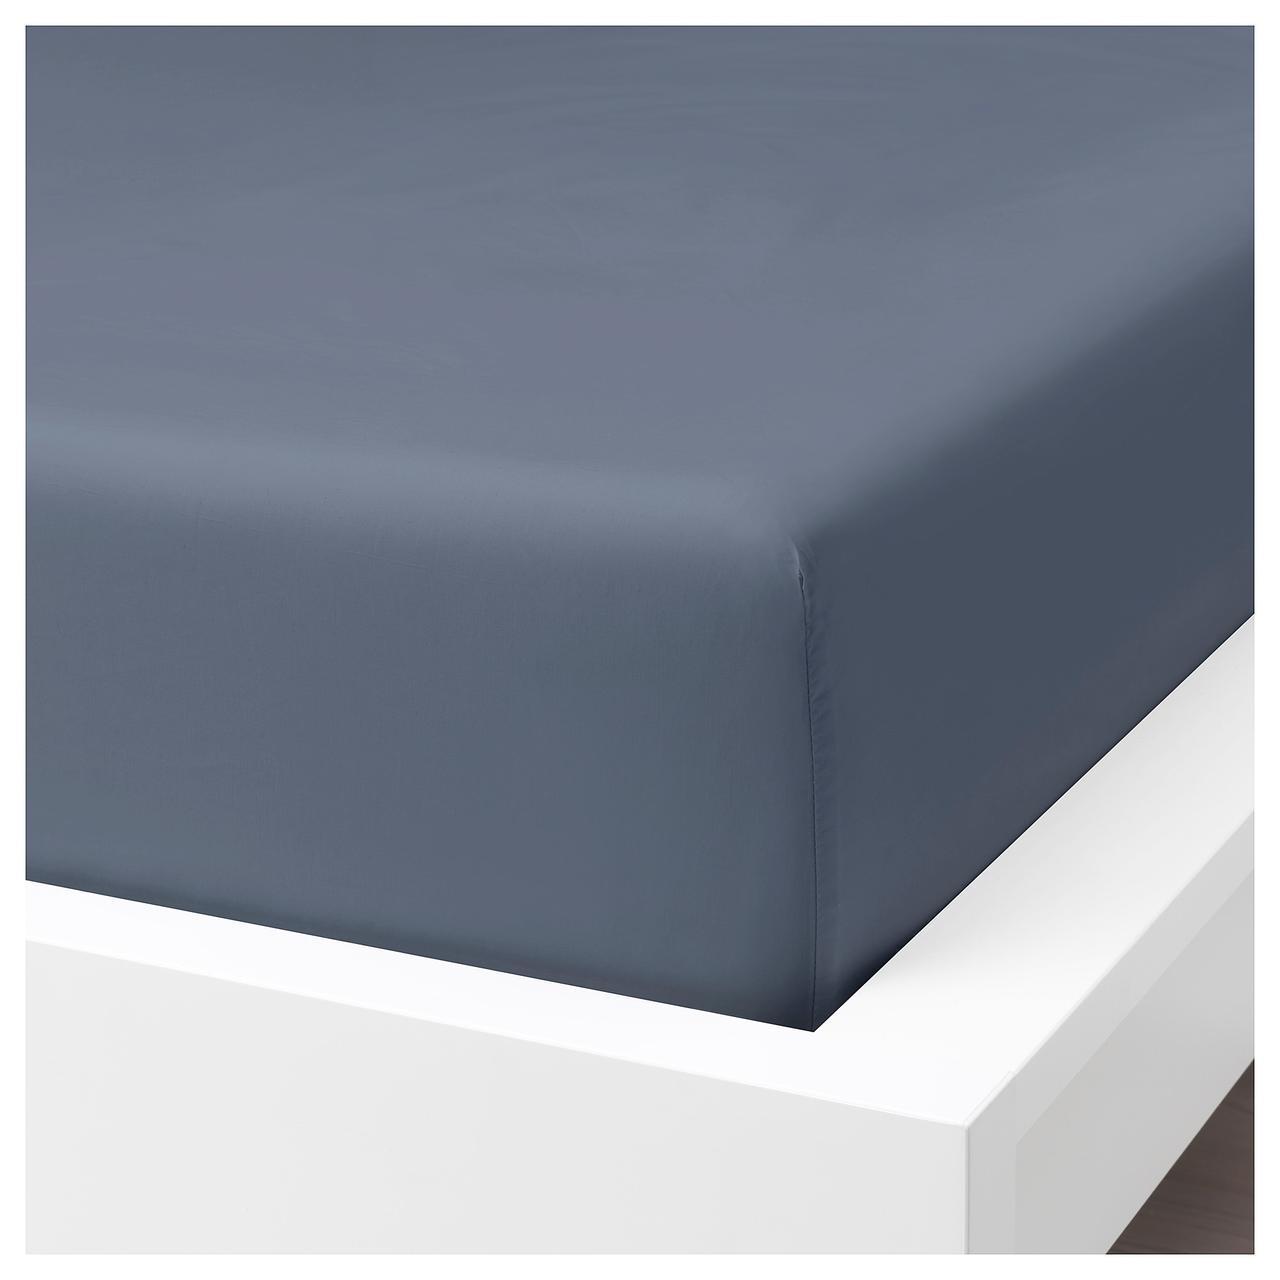 Простыня IKEA SÖMNTUTA 160х200 см на резинке темно-синяя 504.127.63